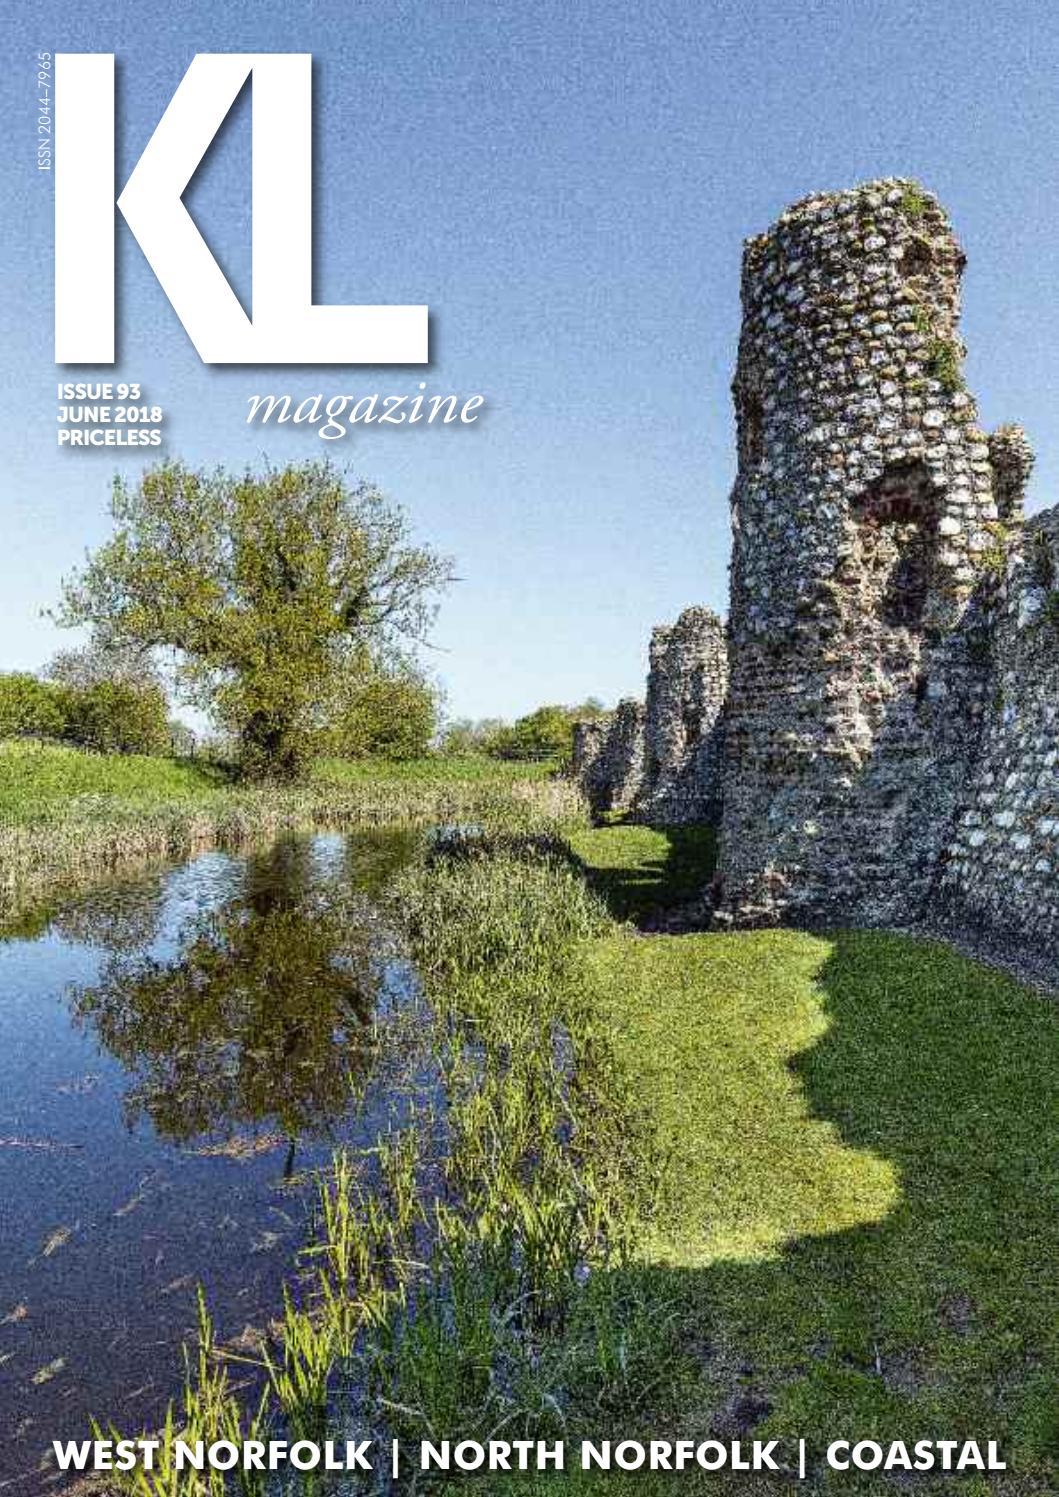 KL Magazine June 2018 by KL magazine - issuu